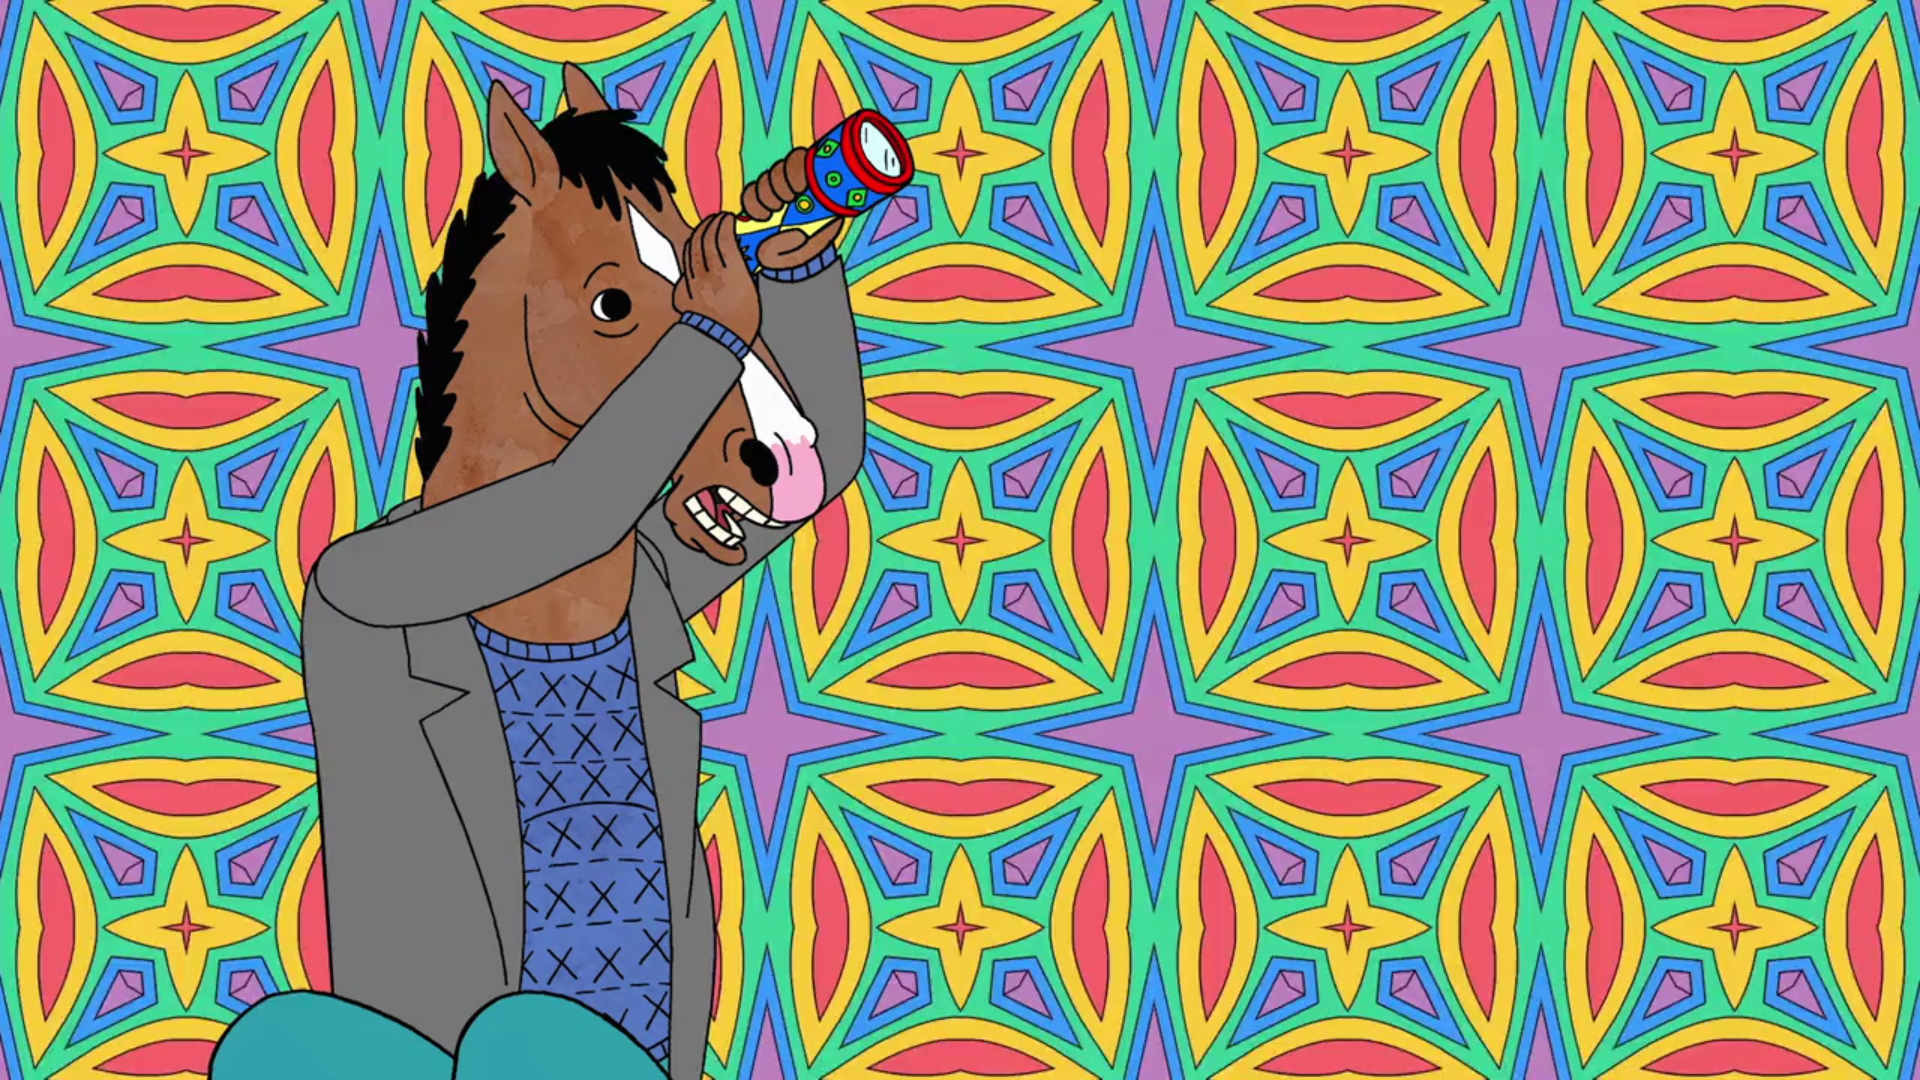 Iphone X Live Wallpaper Gif Download Bojack Horseman Wallpapers 83 Images